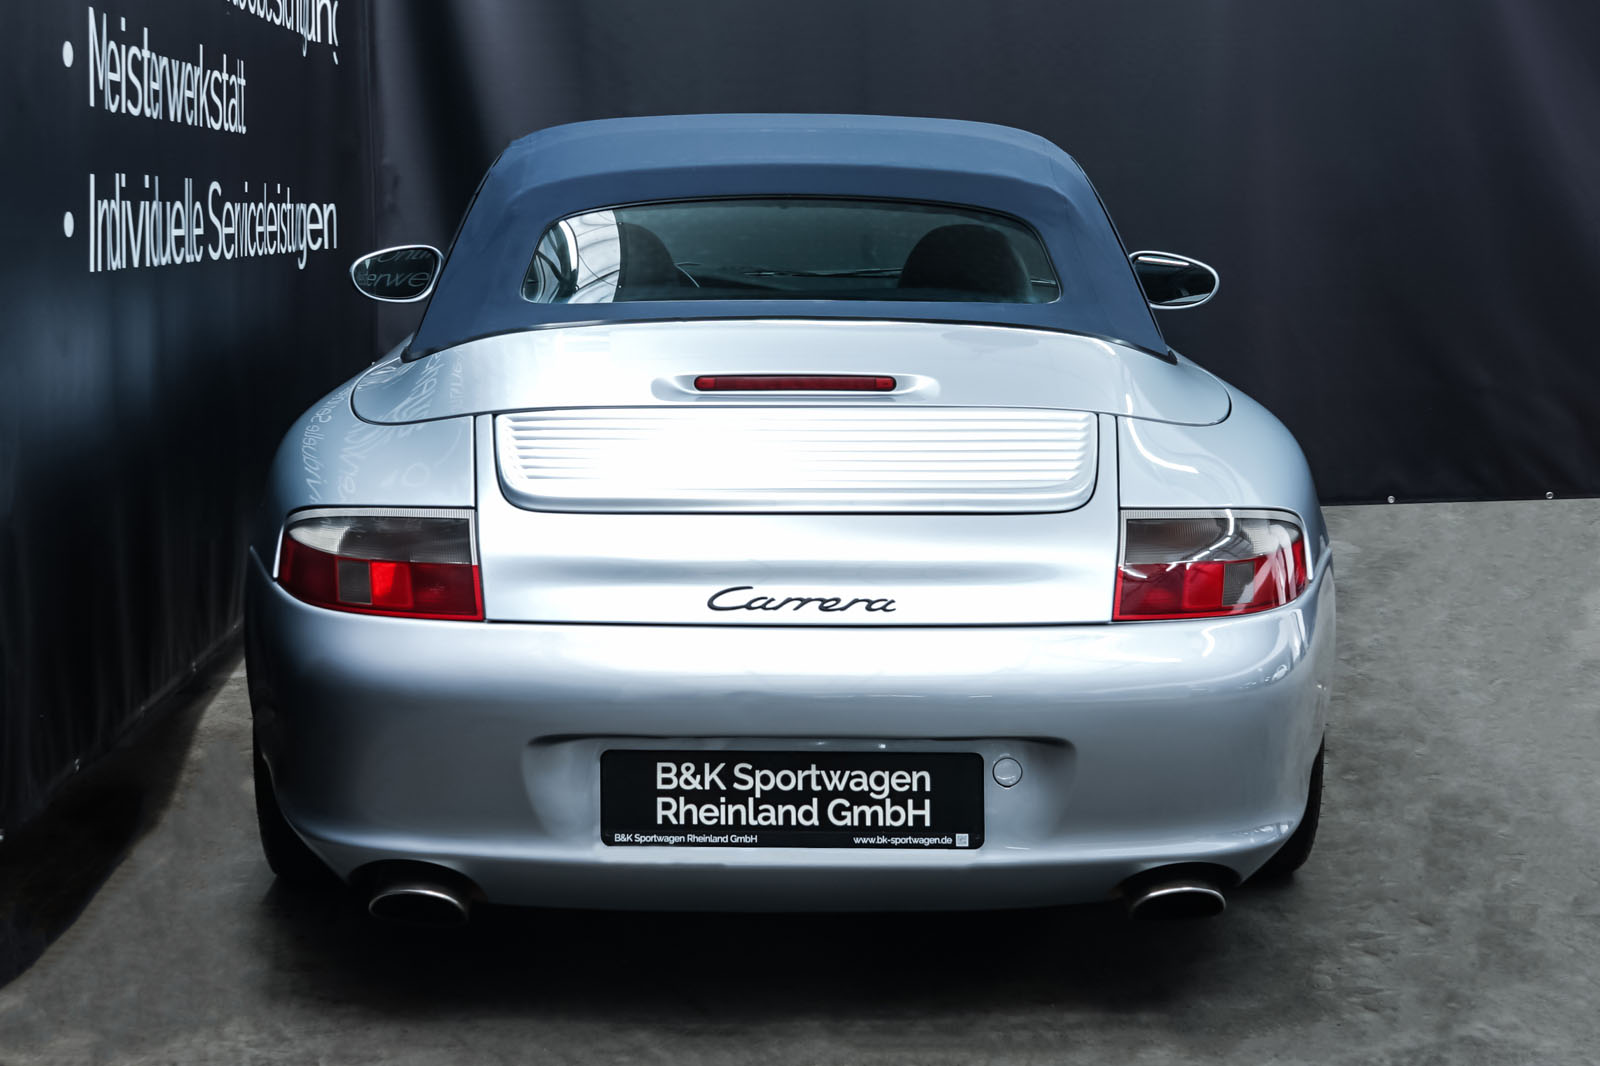 Porsche_996_Cabrio_Silber_Dunkelblau_POR-1724_21_w